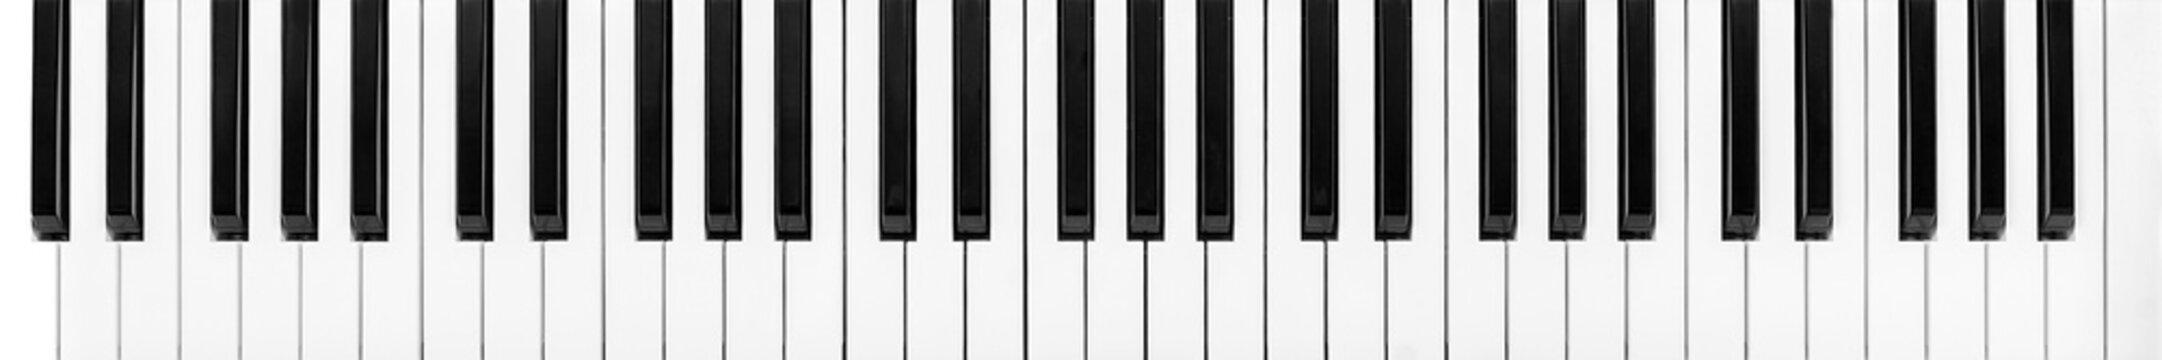 Piano keyboard,electric piano